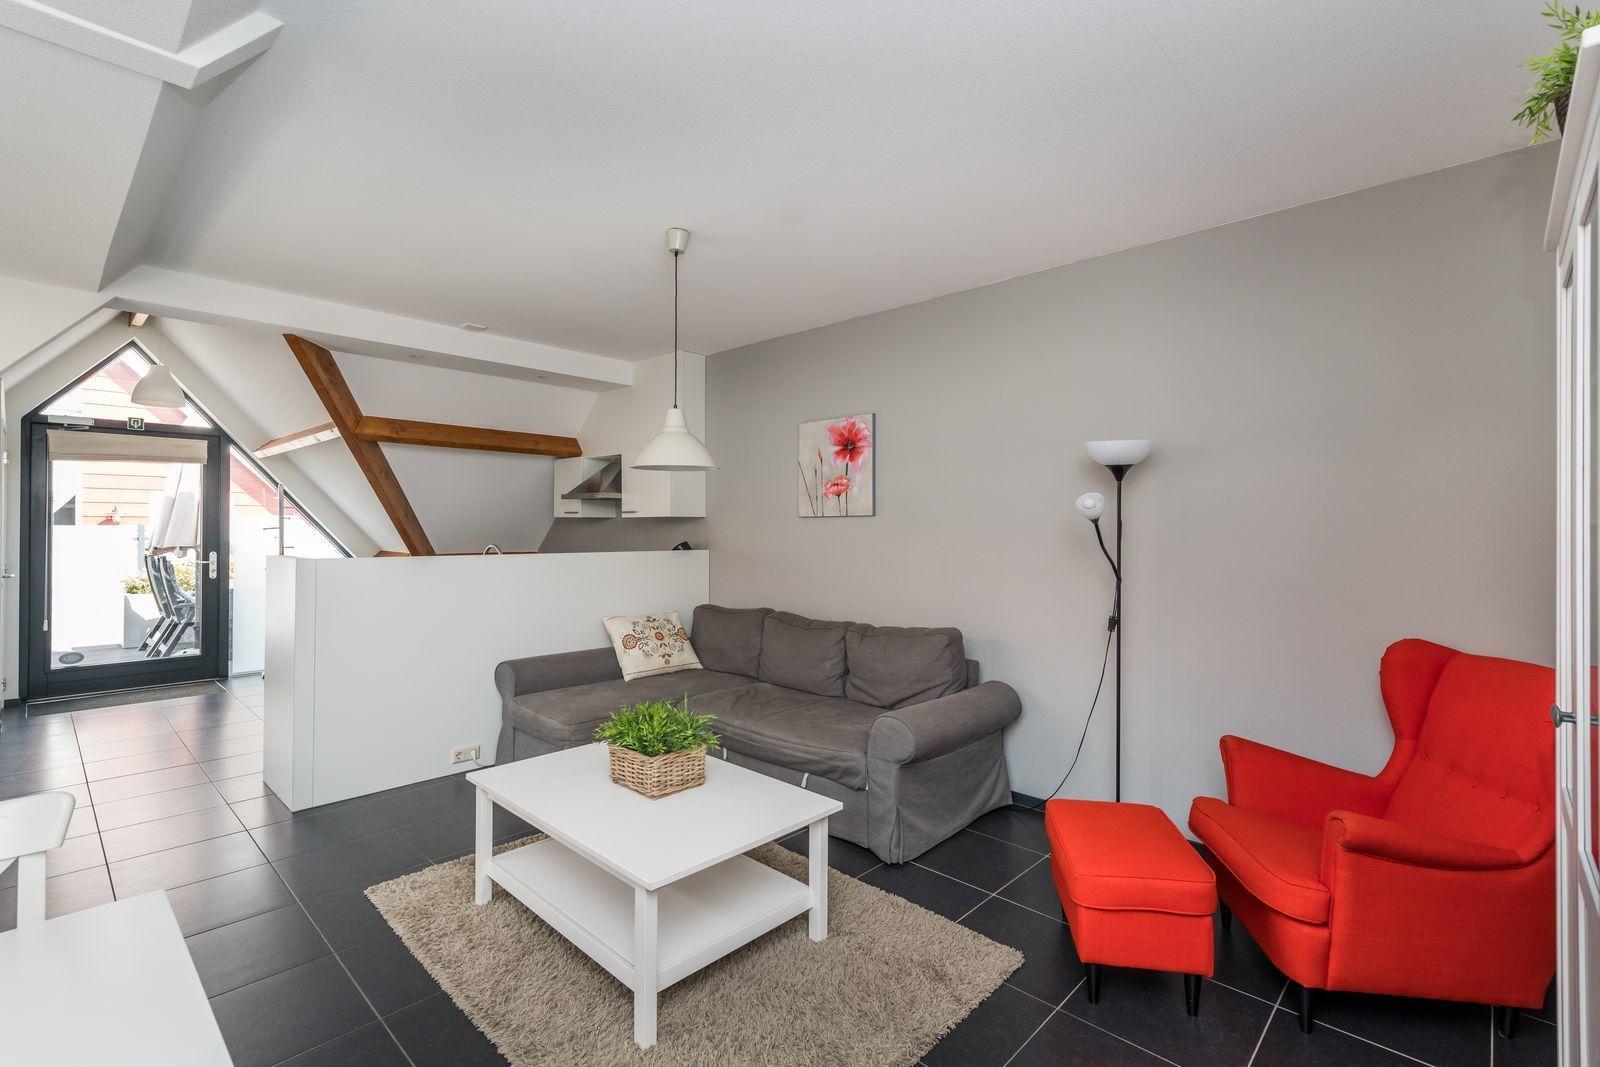 Weststraat 22 - Ouddorp - Appartement Zuid